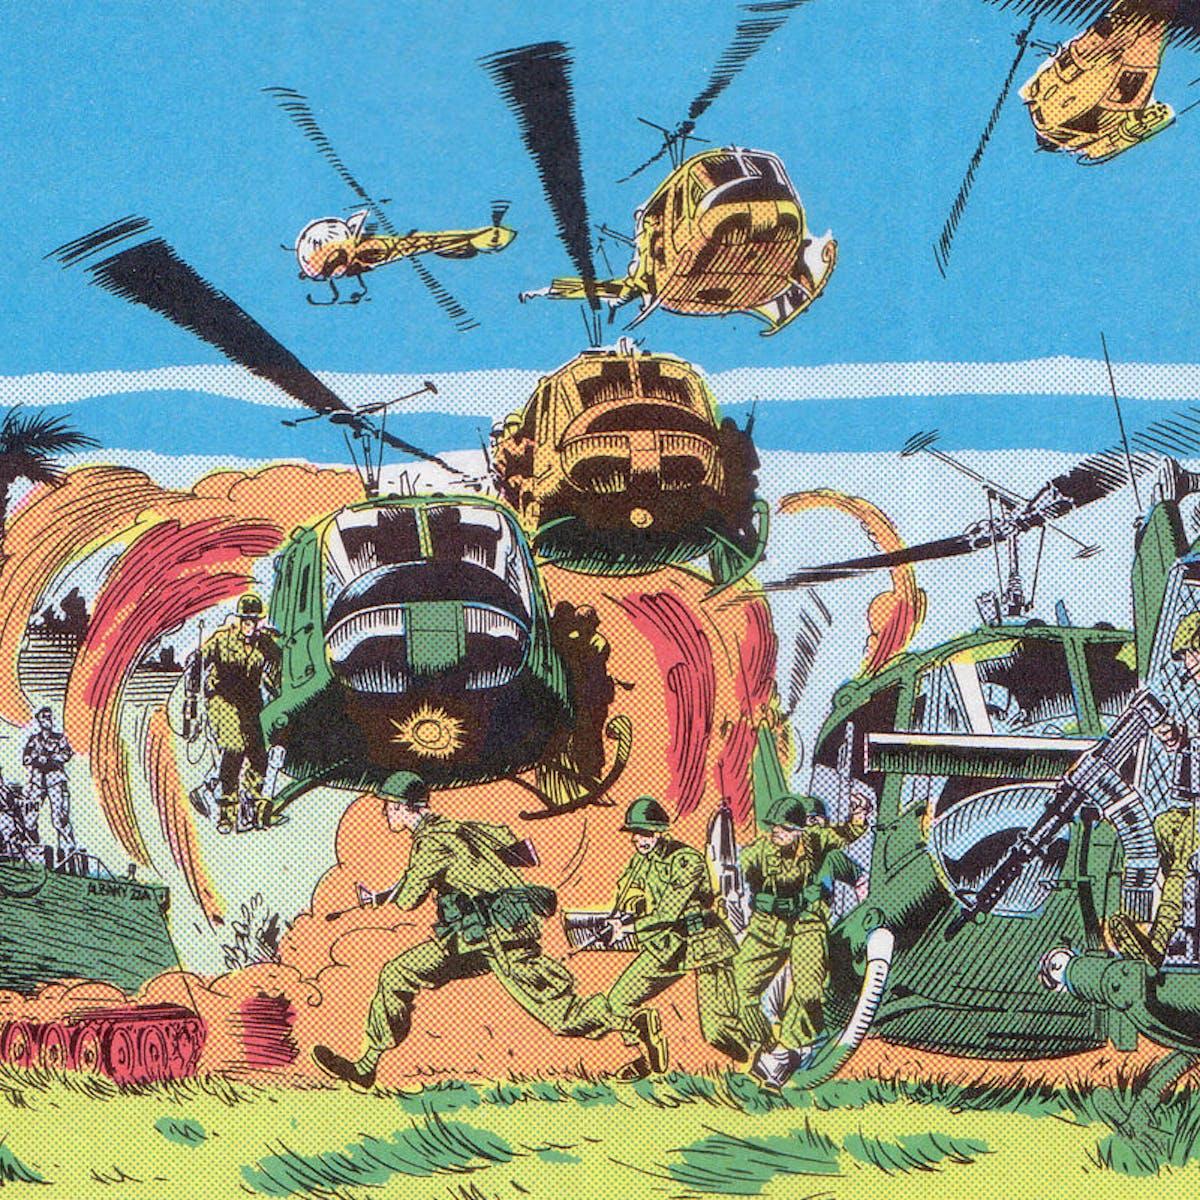 Comics captured America's growing ambivalence about the Vietnam War